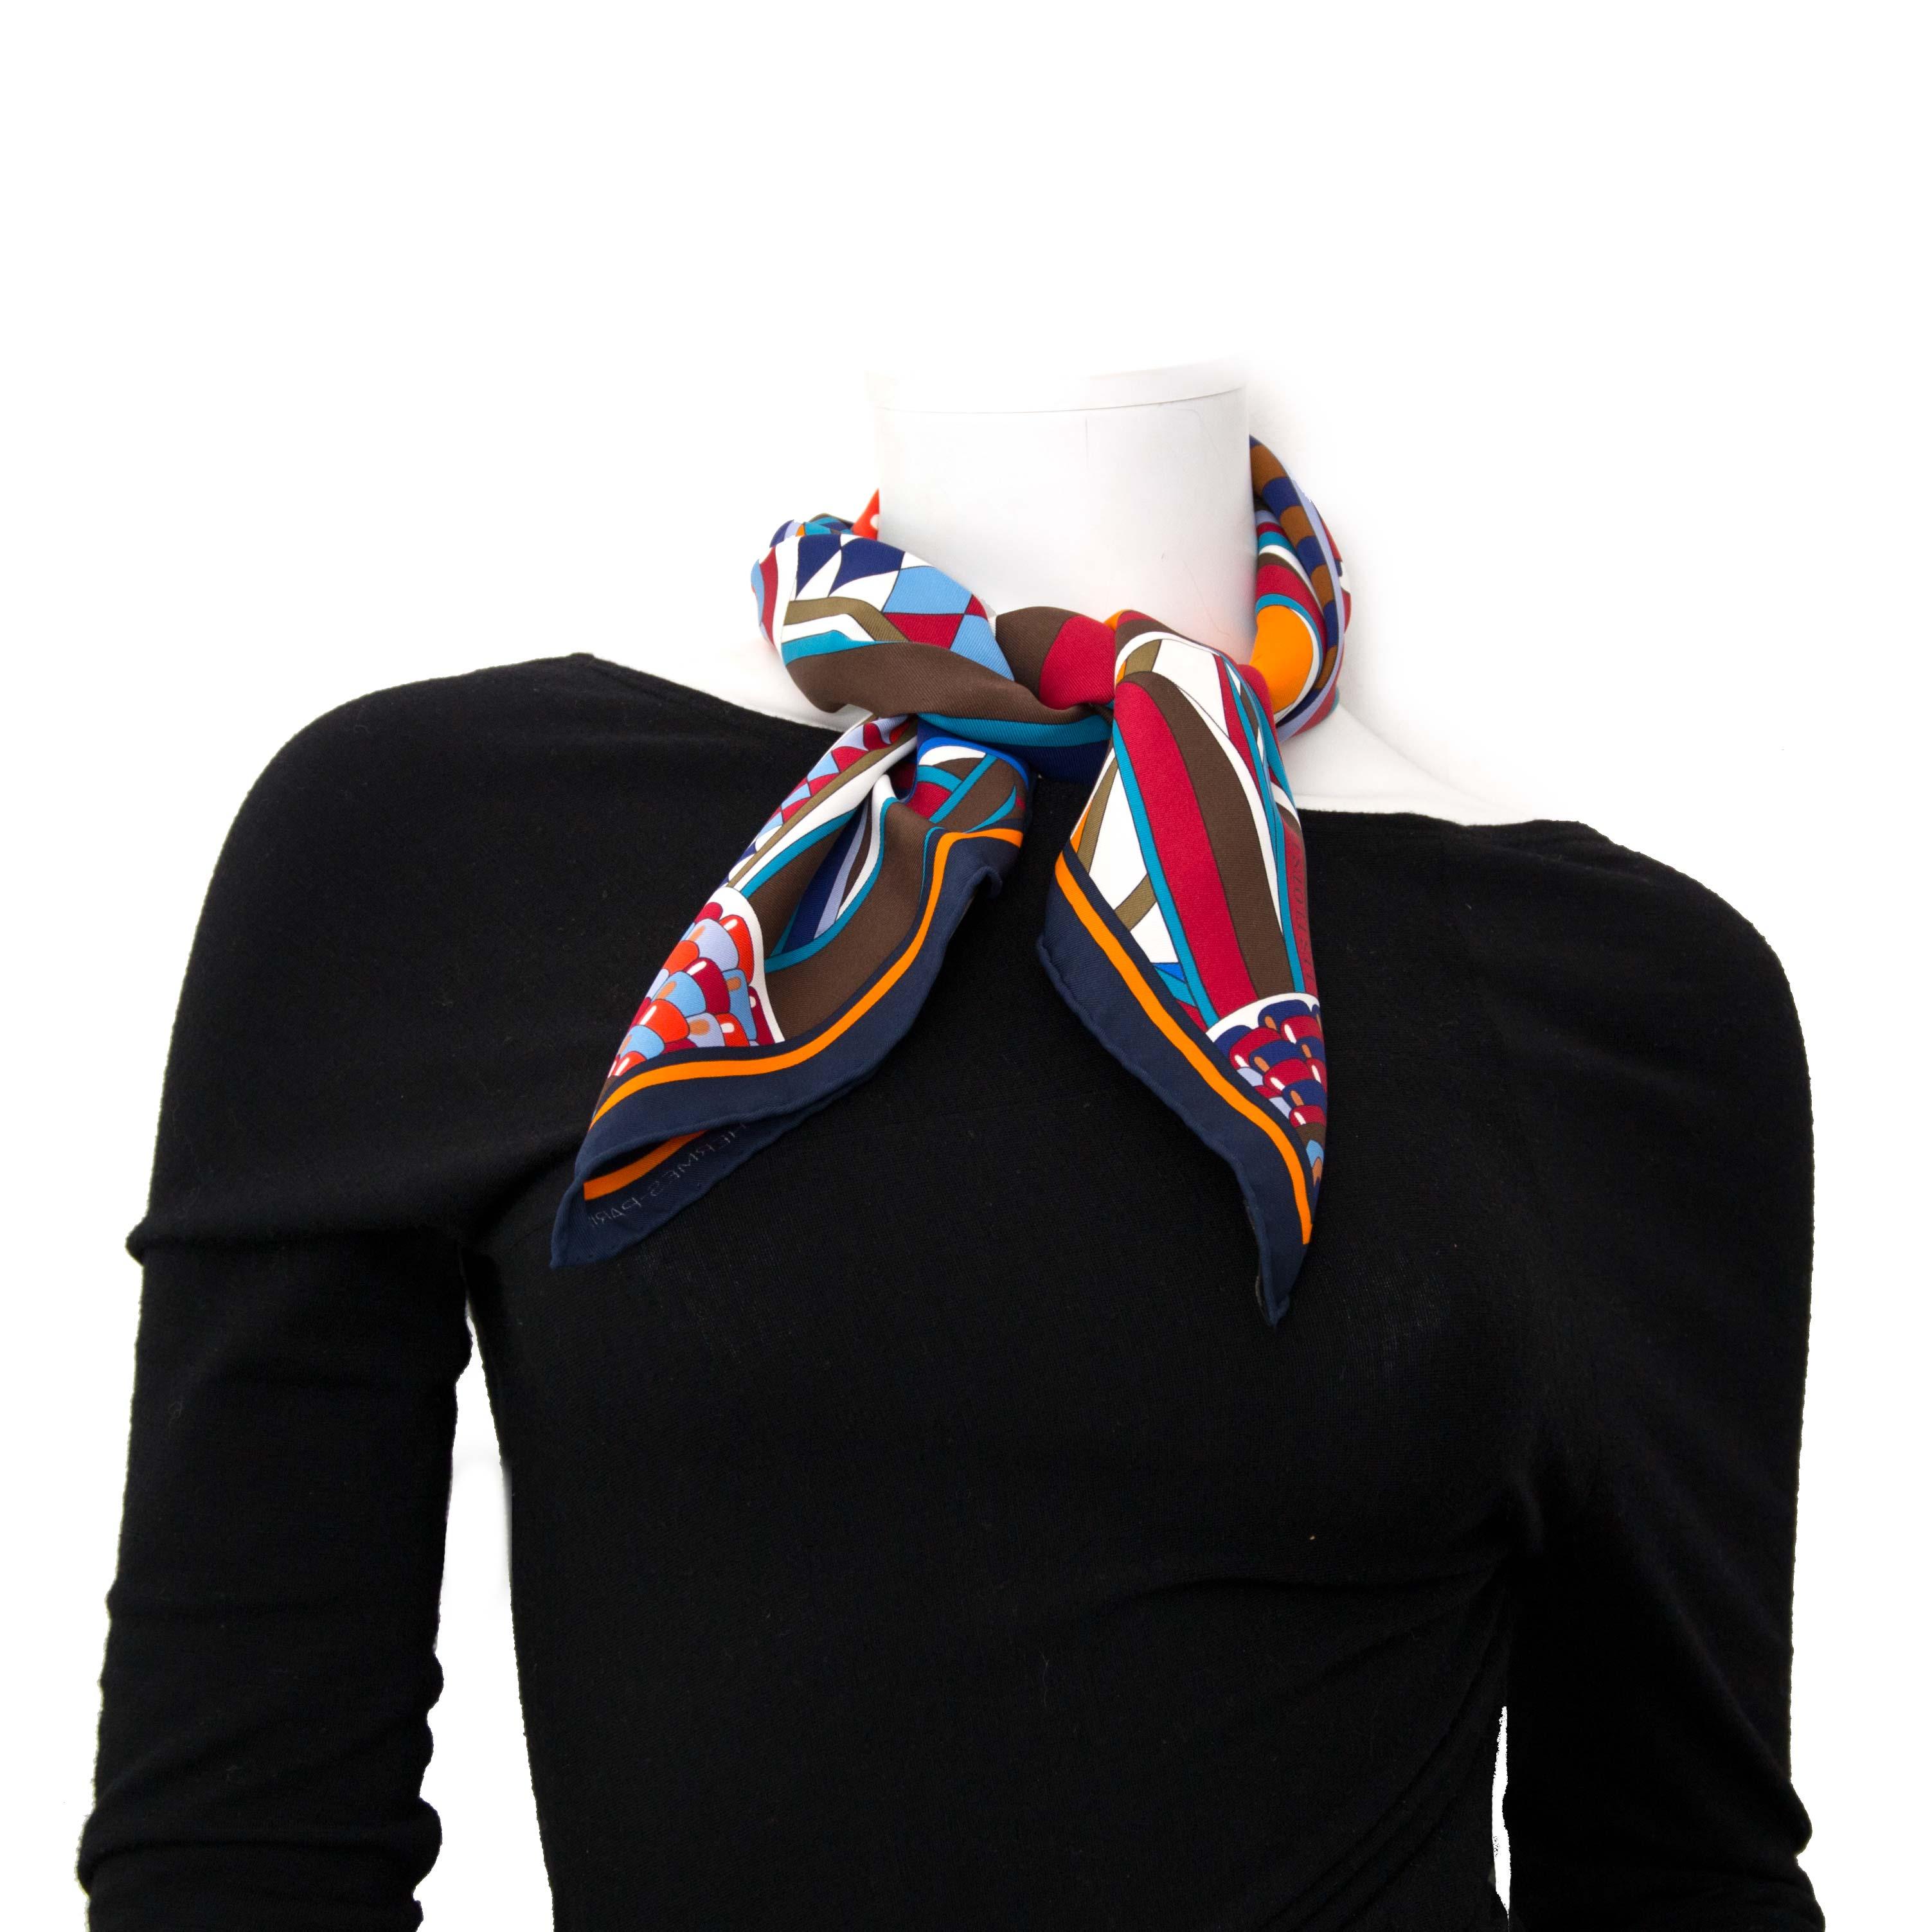 koop online aan de beste prijs jou tweedehands Hermès Silk Scarf Carré 'Les Flots Du Cheval'